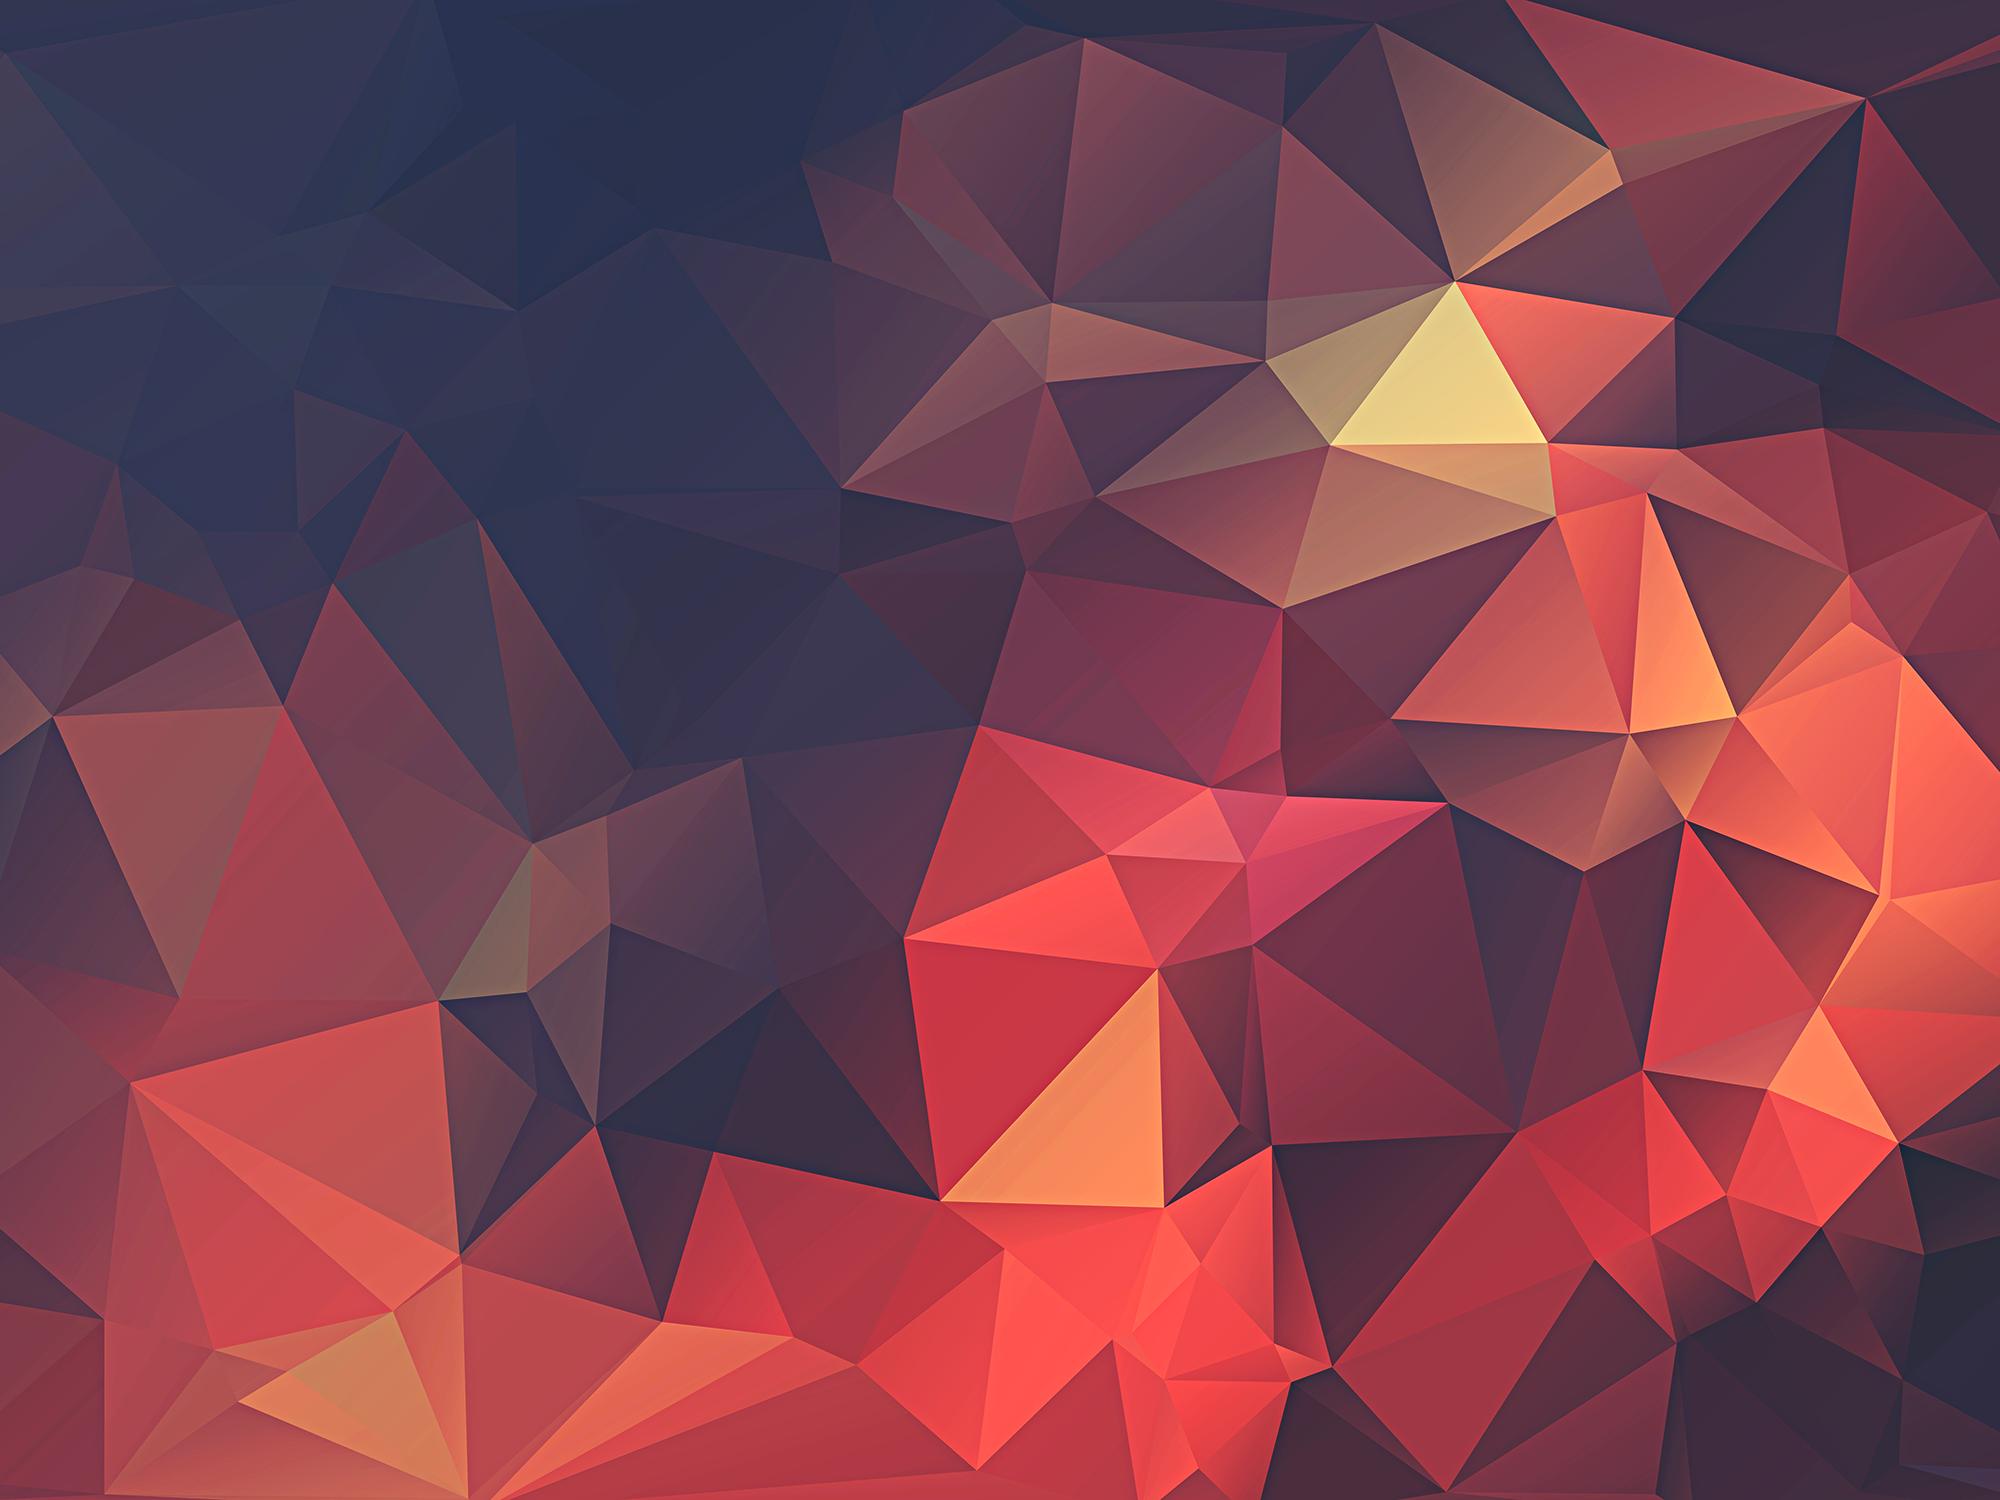 Геометрия дизайн картинки